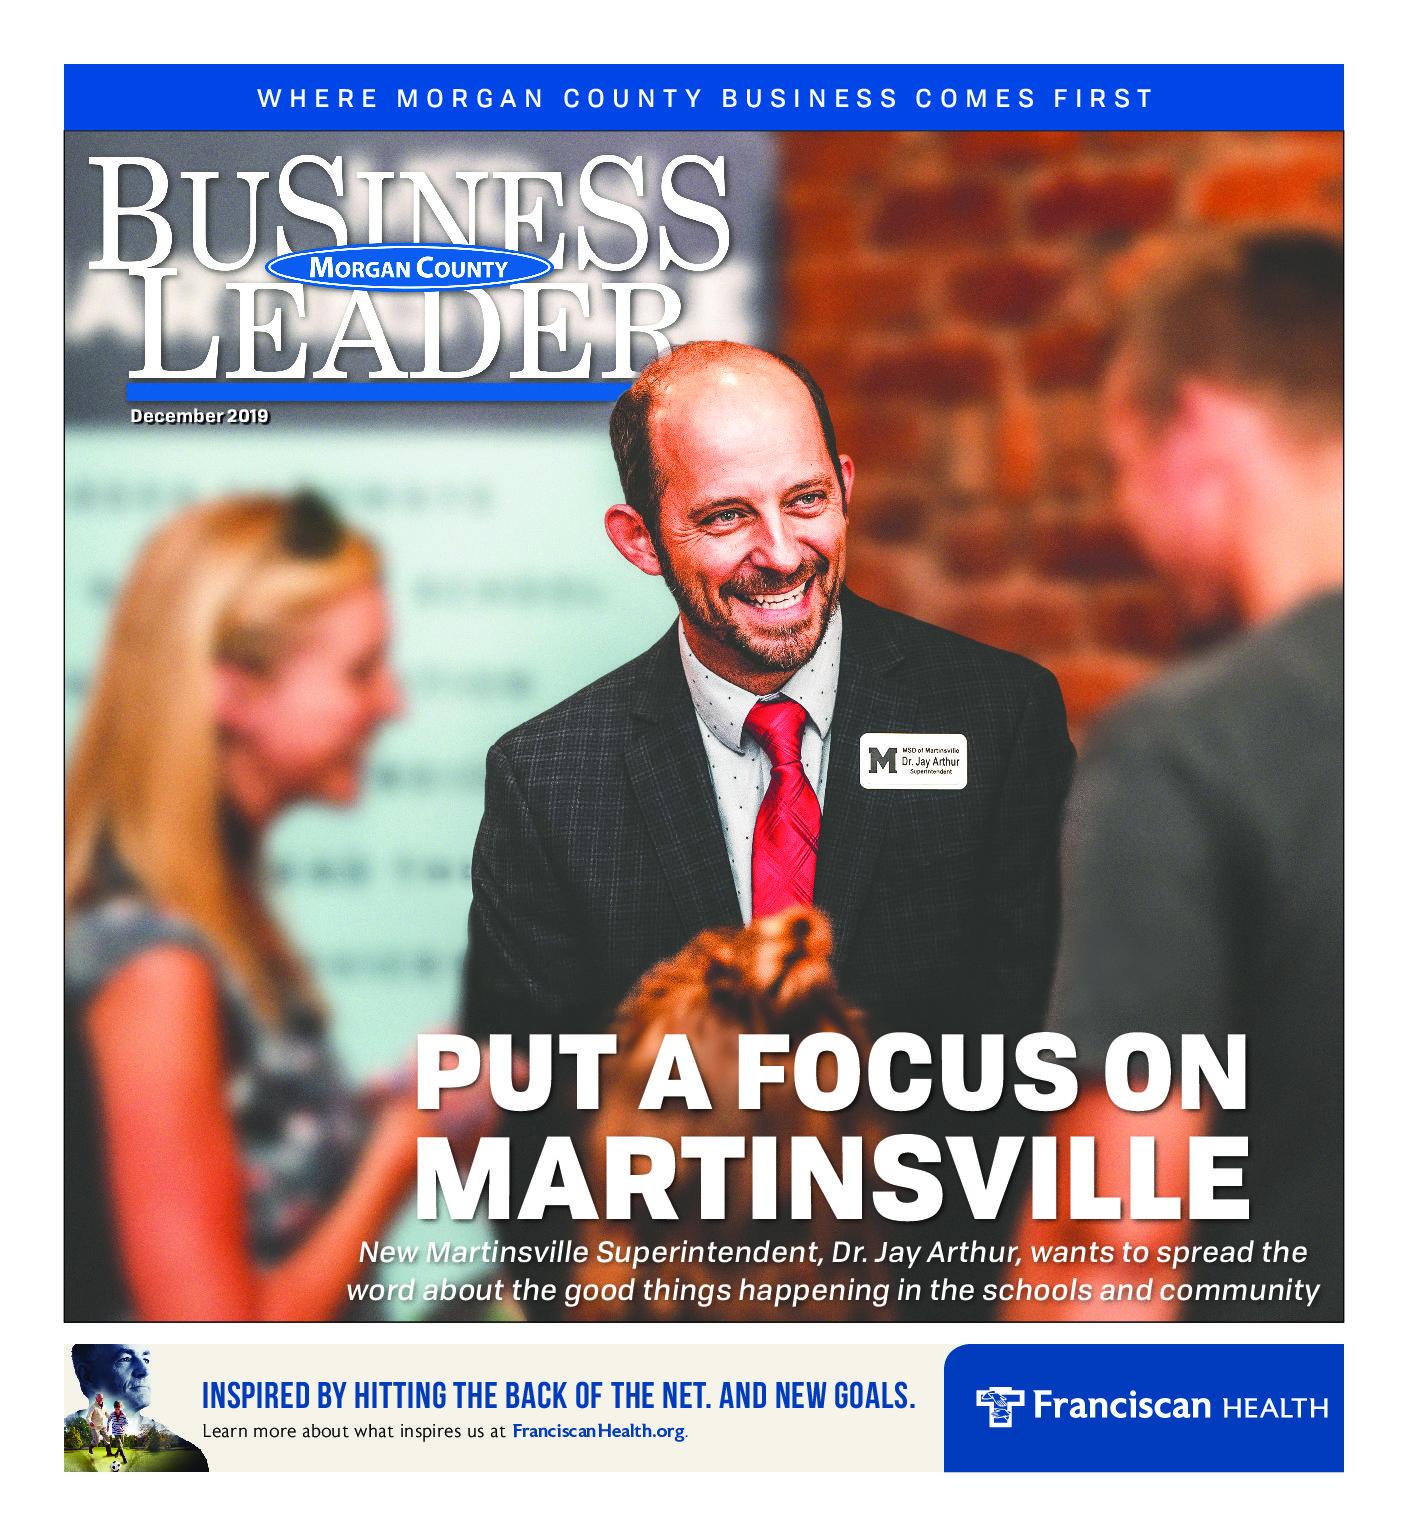 Put a Focus on Martinsville